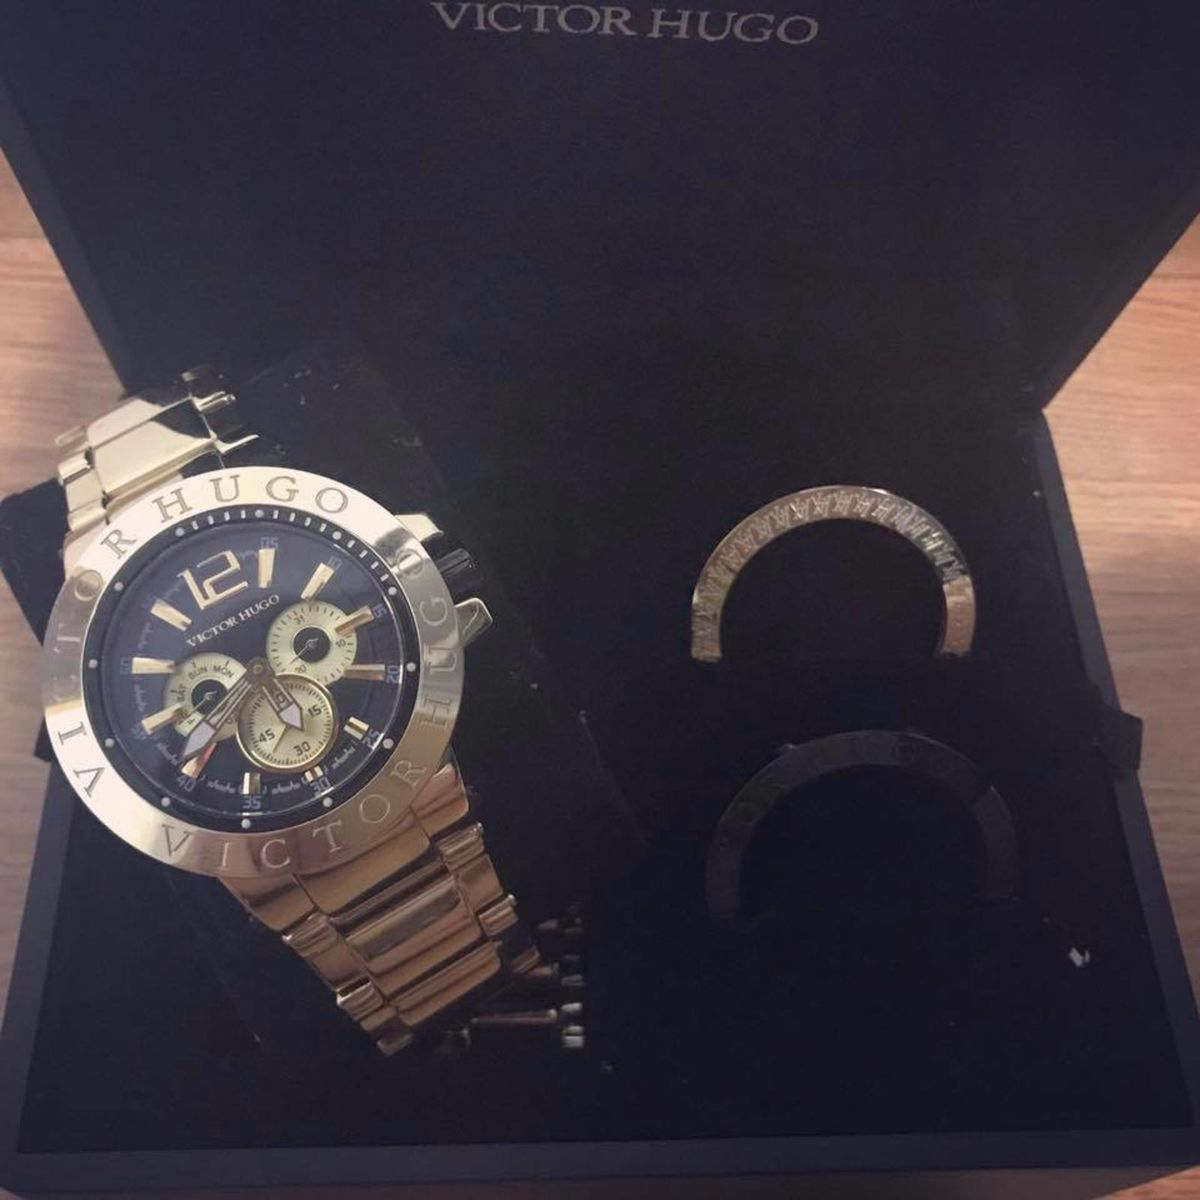 cb1ba0c1410 Relógio Victor Hugo.